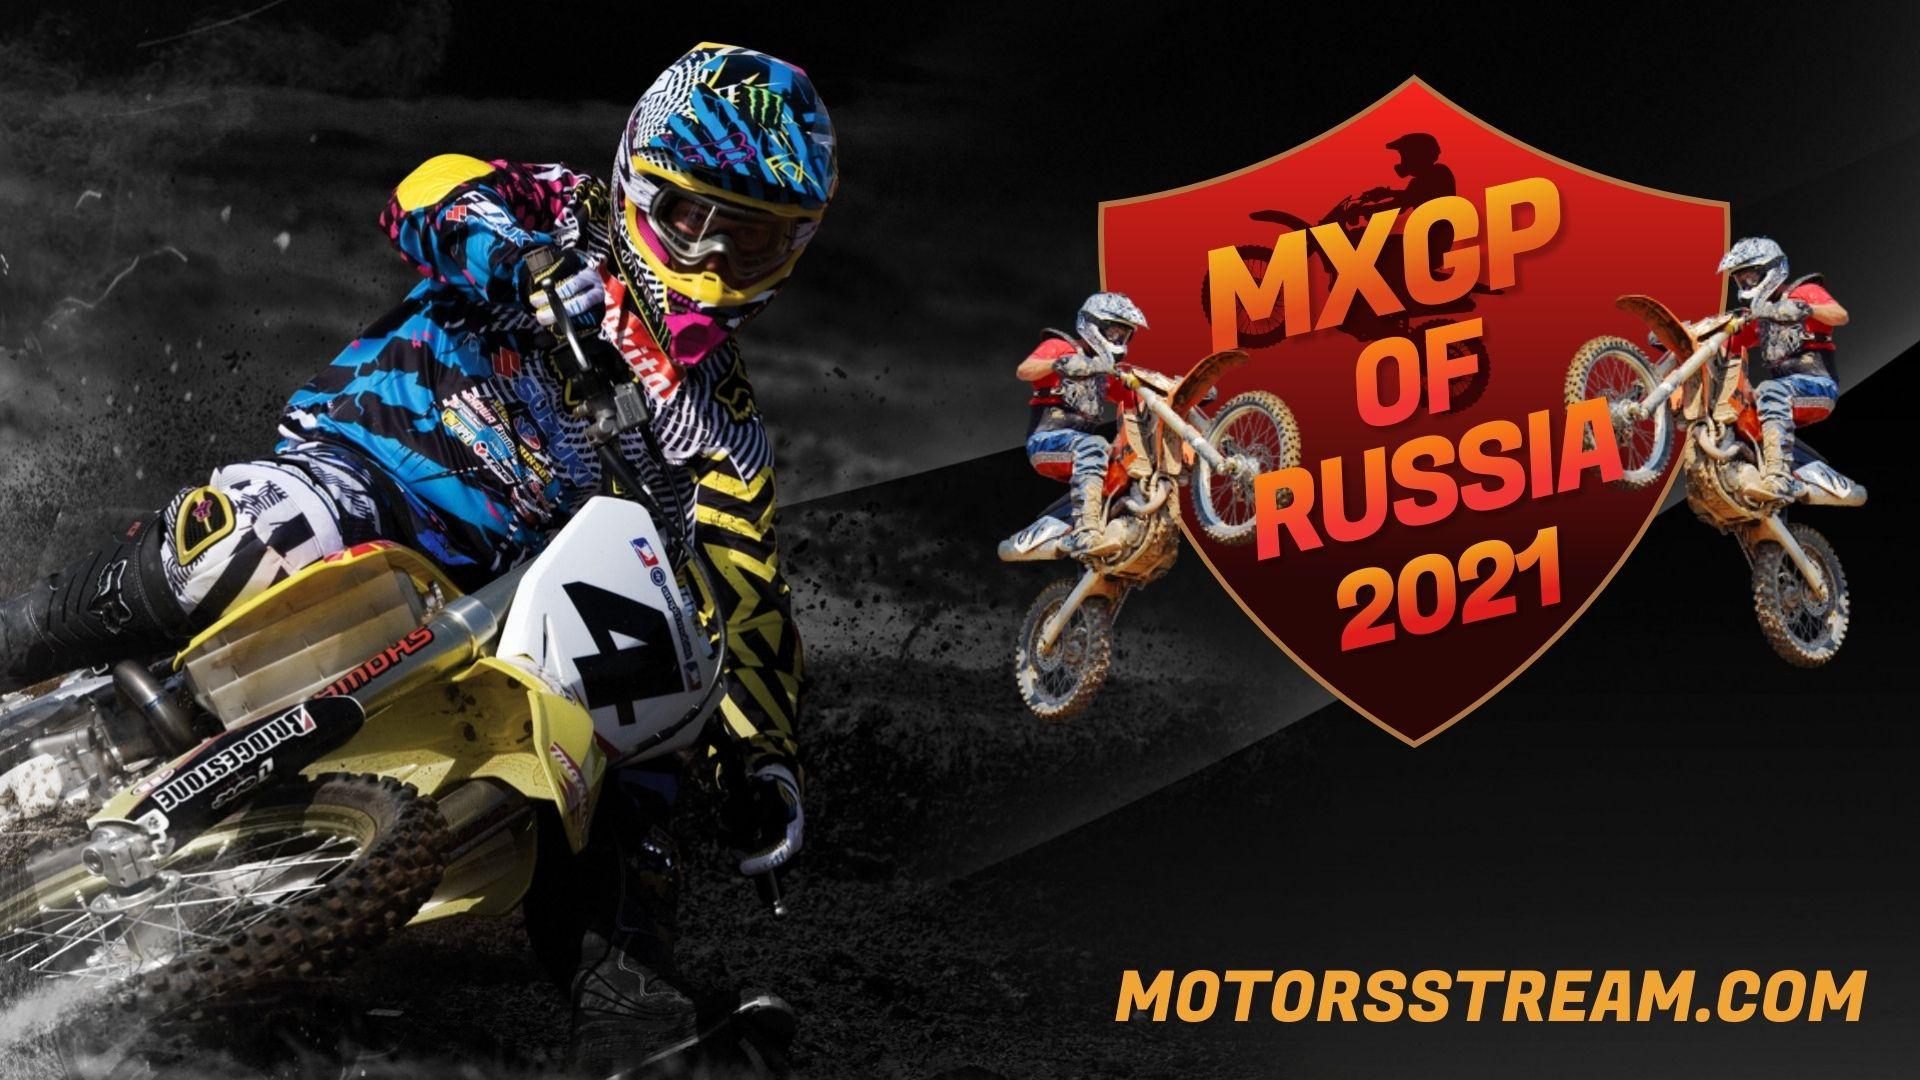 FIM Motocross WC Russia Live Stream 2021 | MXGP